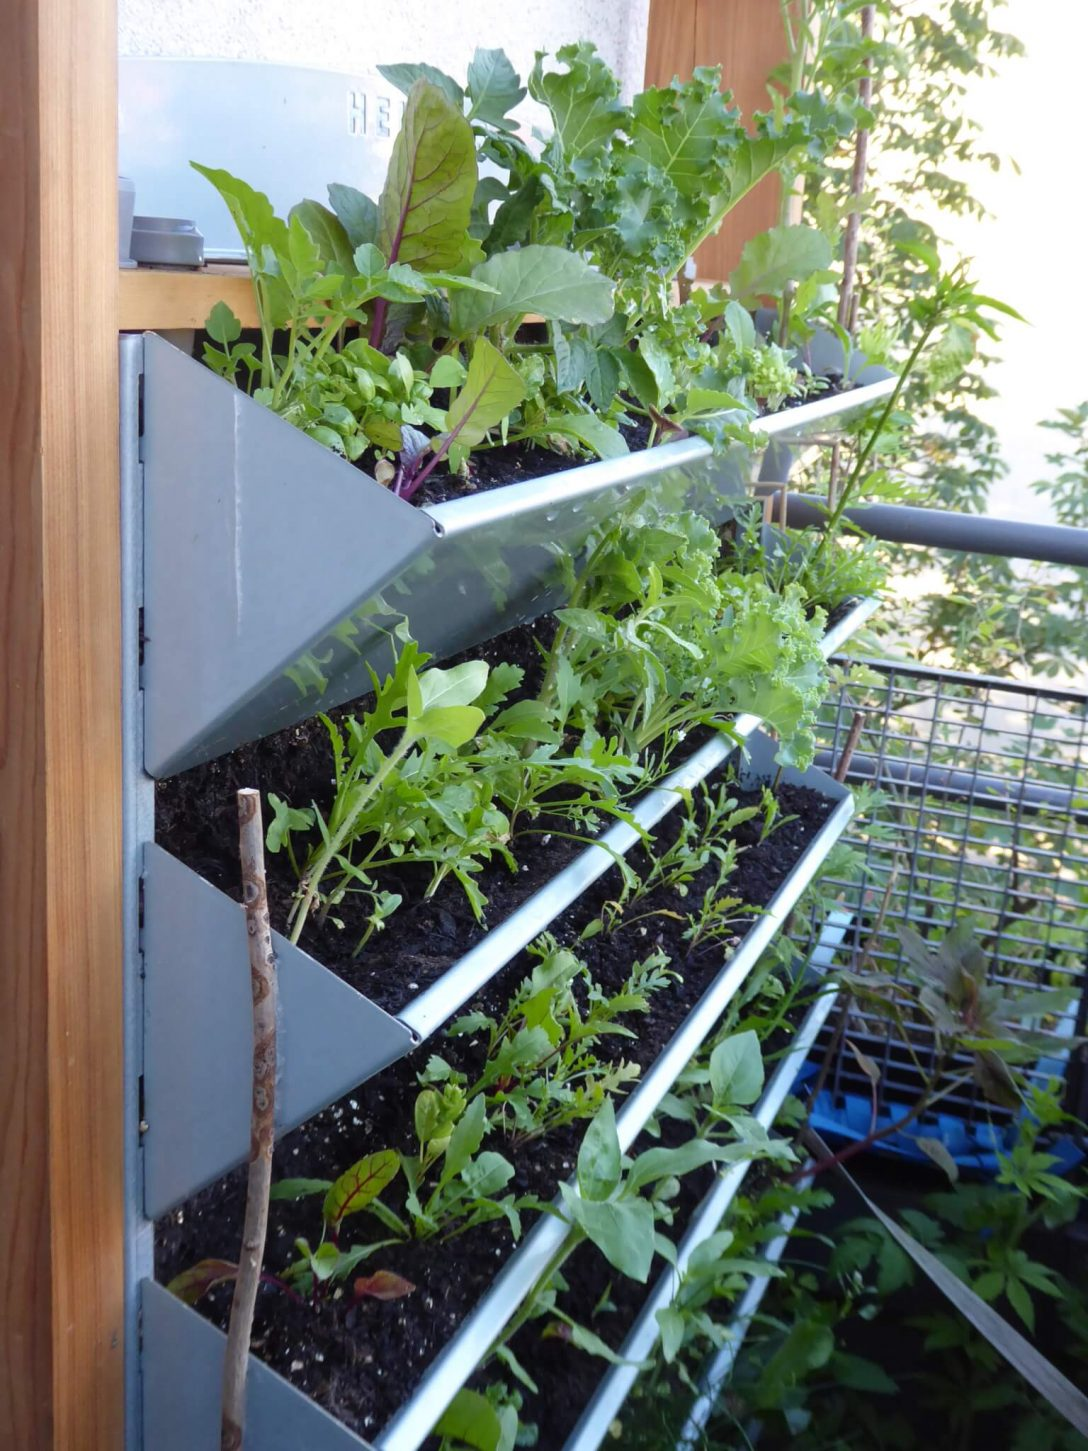 Large Size of Vertikal Garten Vertical Garden Plans Pdf Indoor Diy Gardening Book Vegetable Wall Adalah Ideas Plants Vegetables Kit Construction Details Systems Amazon Garten Vertikal Garten